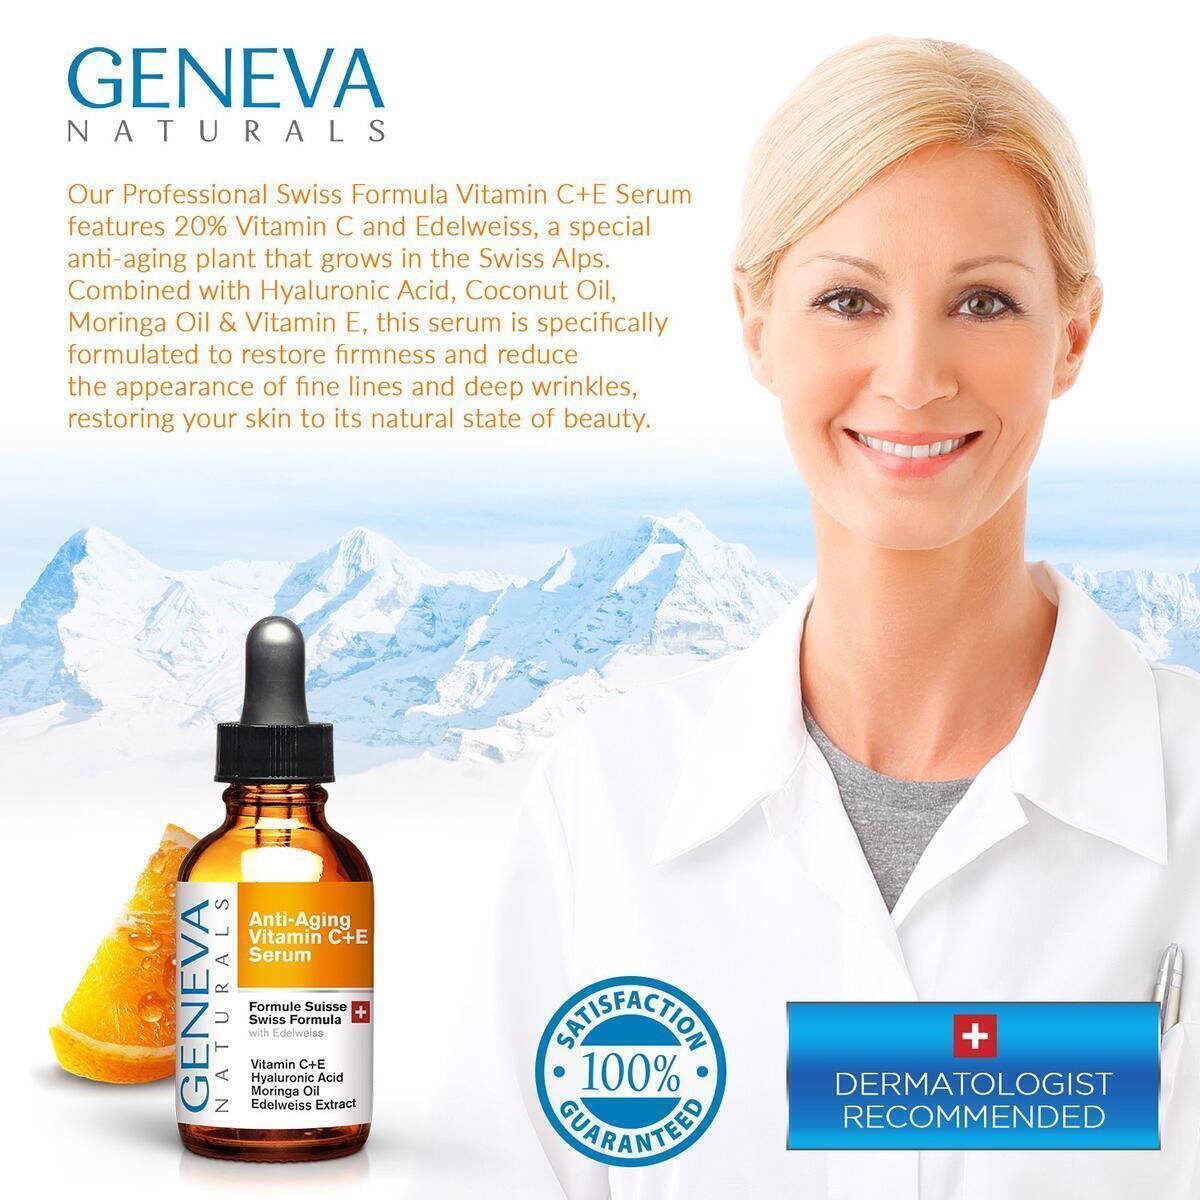 Premium Vitamin C Serum For Face - Anti Aging Hyaluronic Acid Serum with Vitamin A & E - Swiss Skin Care Formula Facial Moisturizer For Women & Men